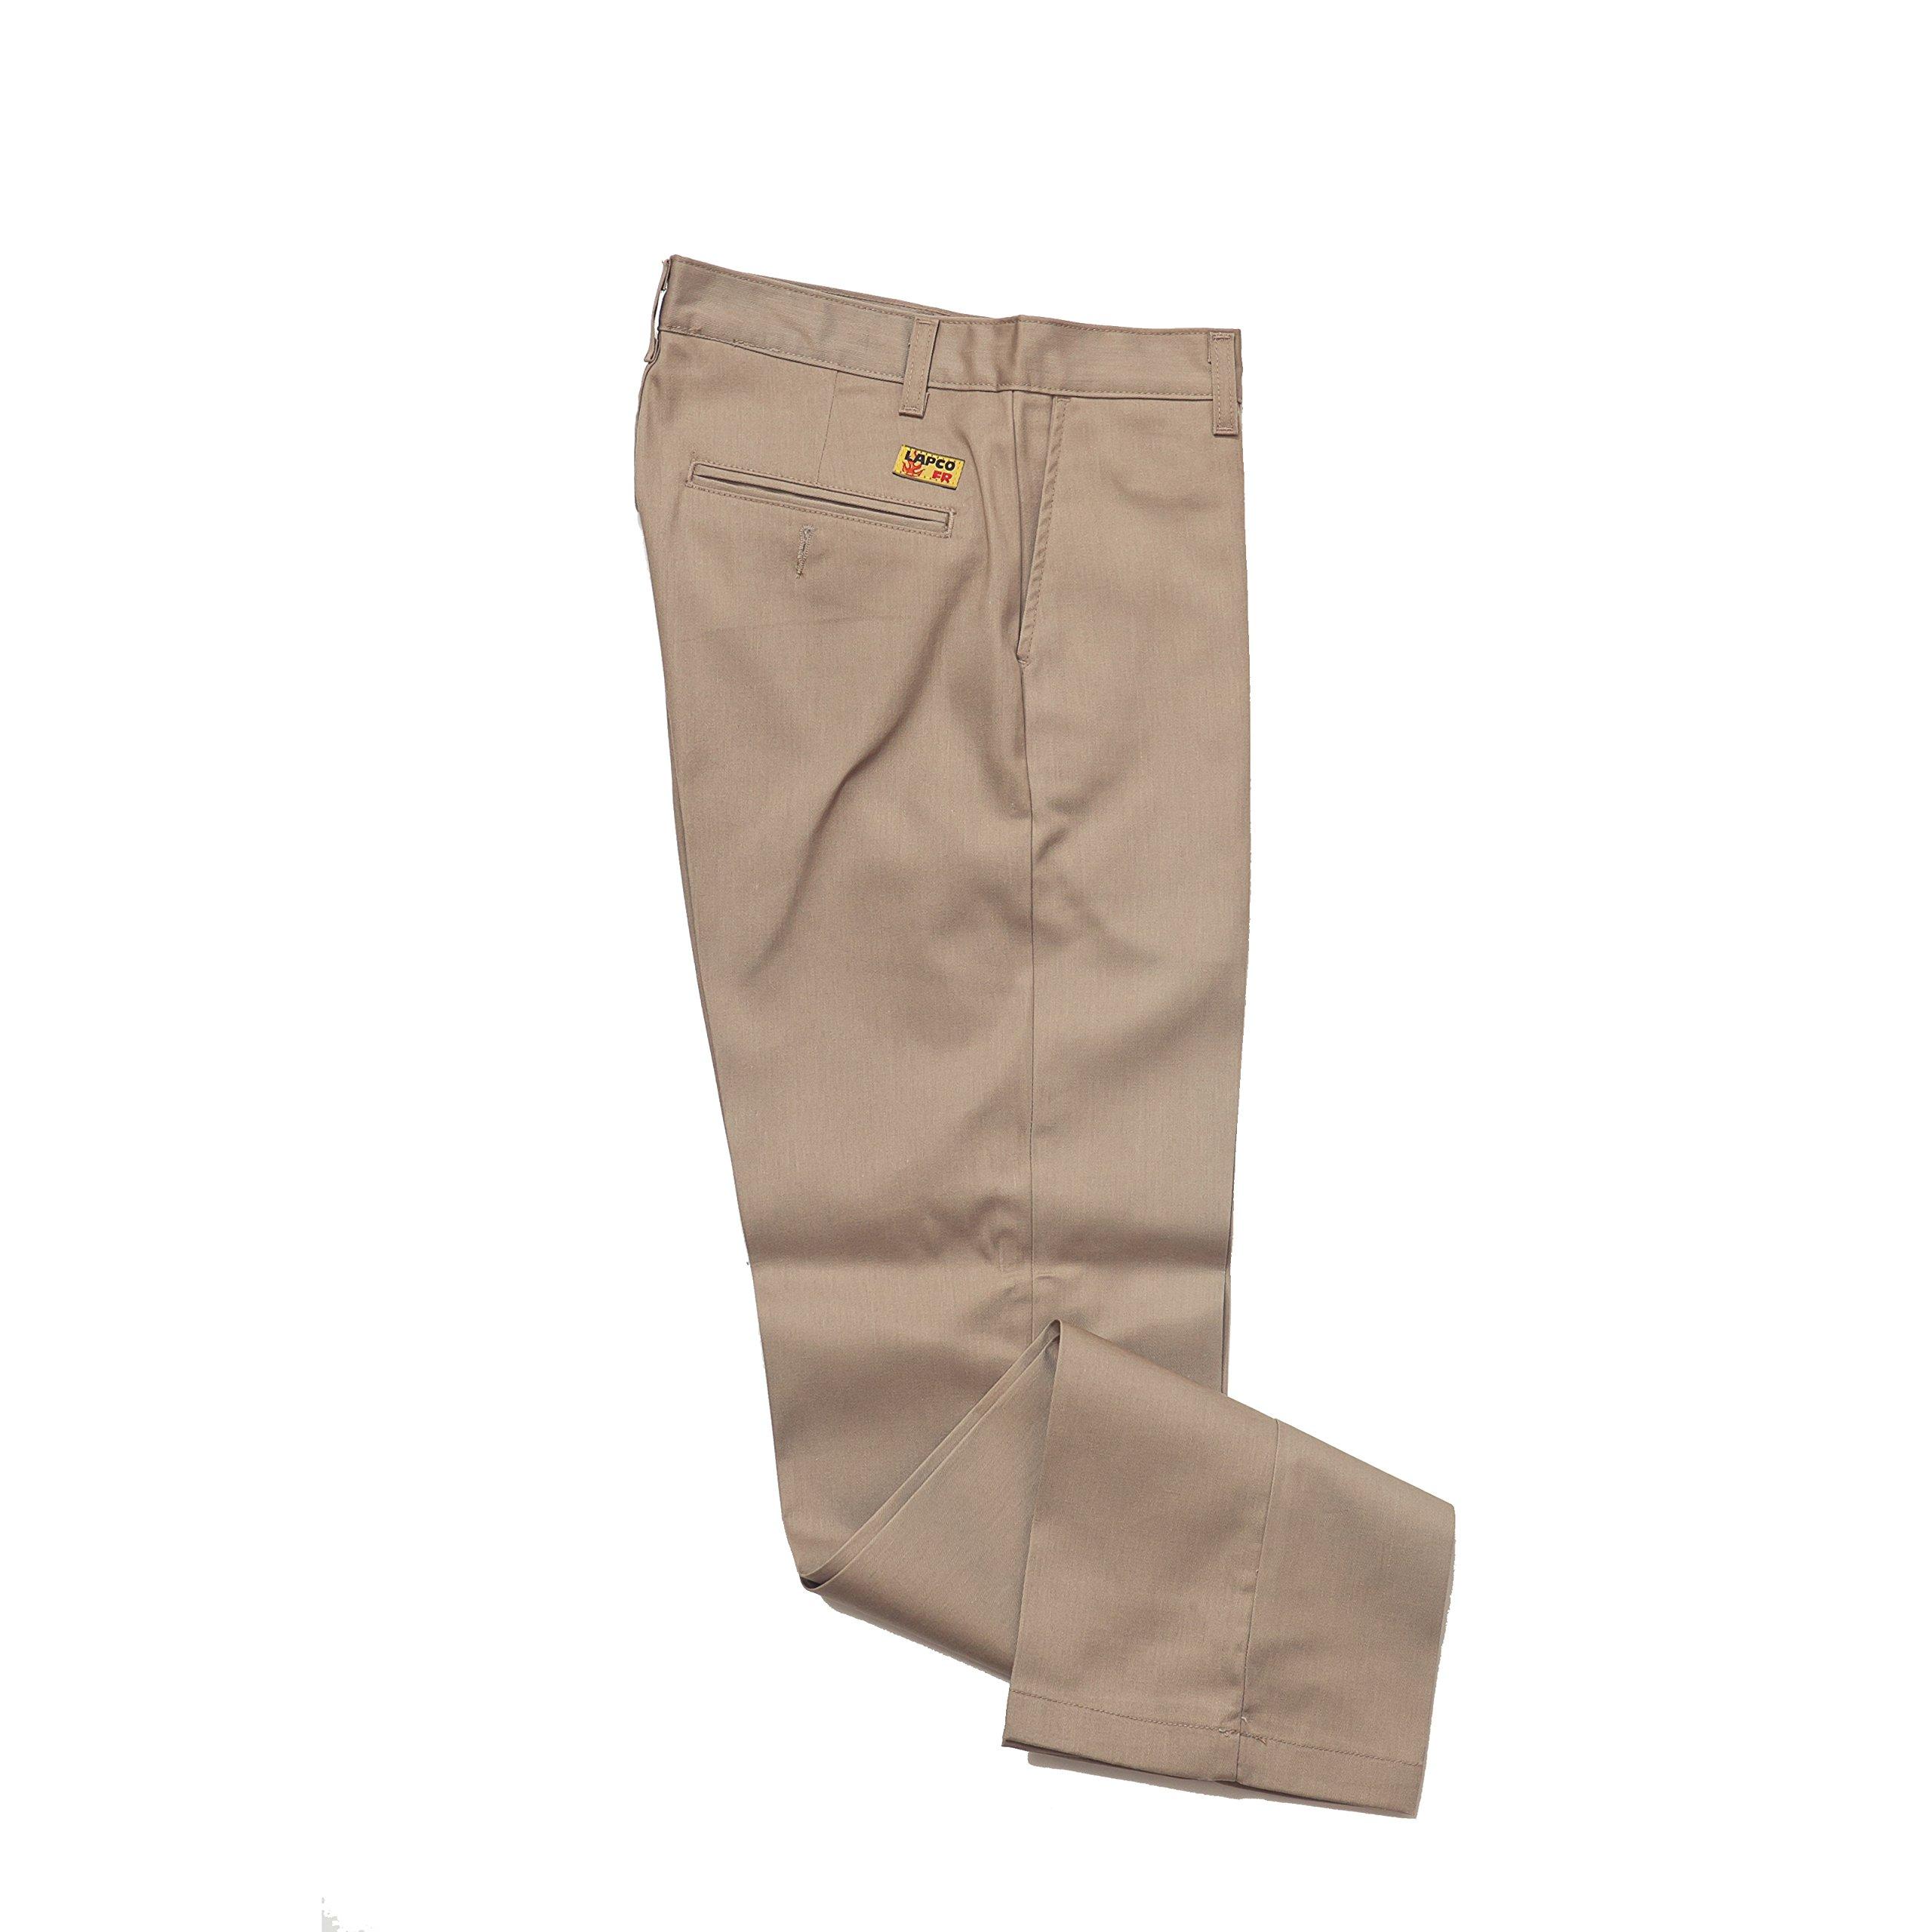 Lapco FR P-INKAC 32X32 Advanced Comfort Uniform Pants, 32'' x 32'', Khaki